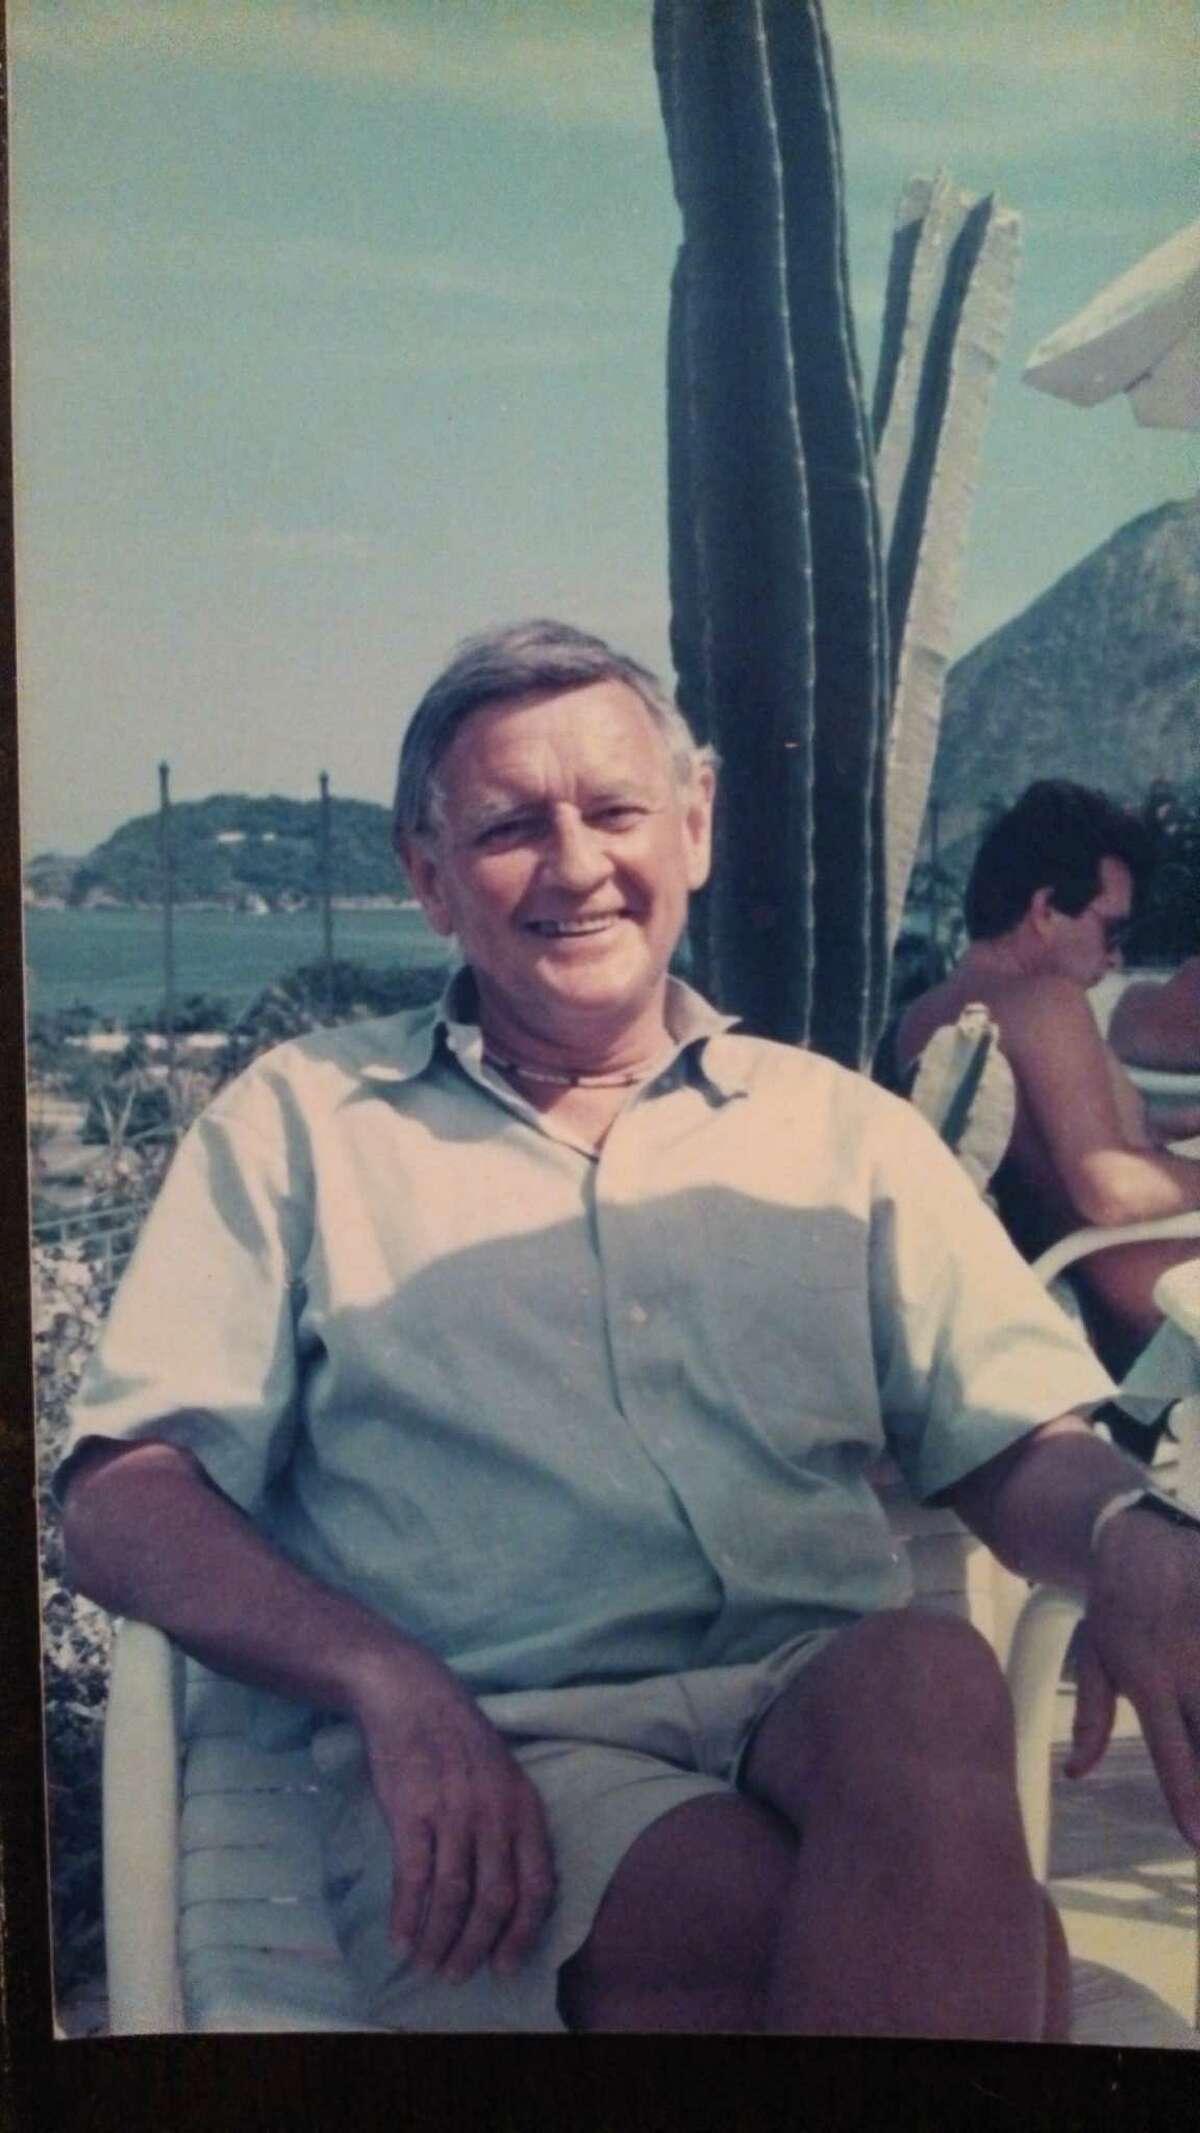 James D. Schmitt is shown in 1990 in Rio de Janeiro, Brazil. (Provided photo)